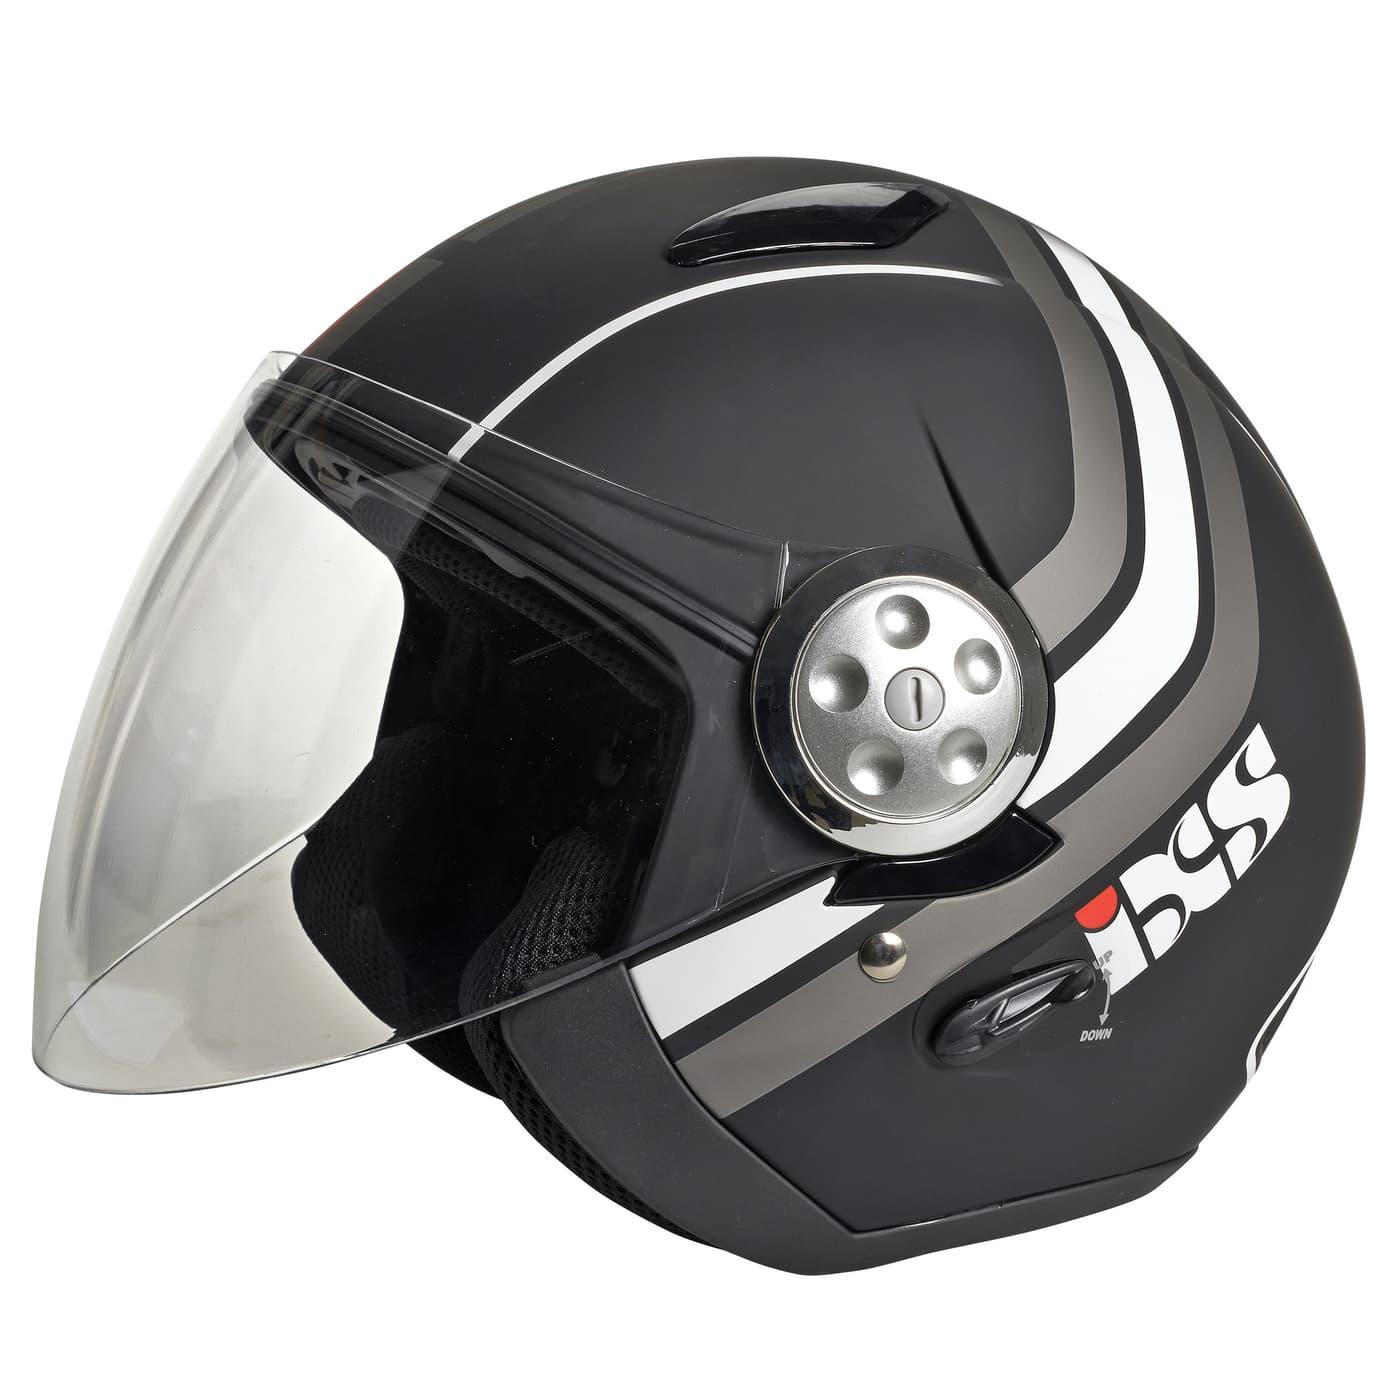 ixs hx 137 style casque de moto jet migros. Black Bedroom Furniture Sets. Home Design Ideas